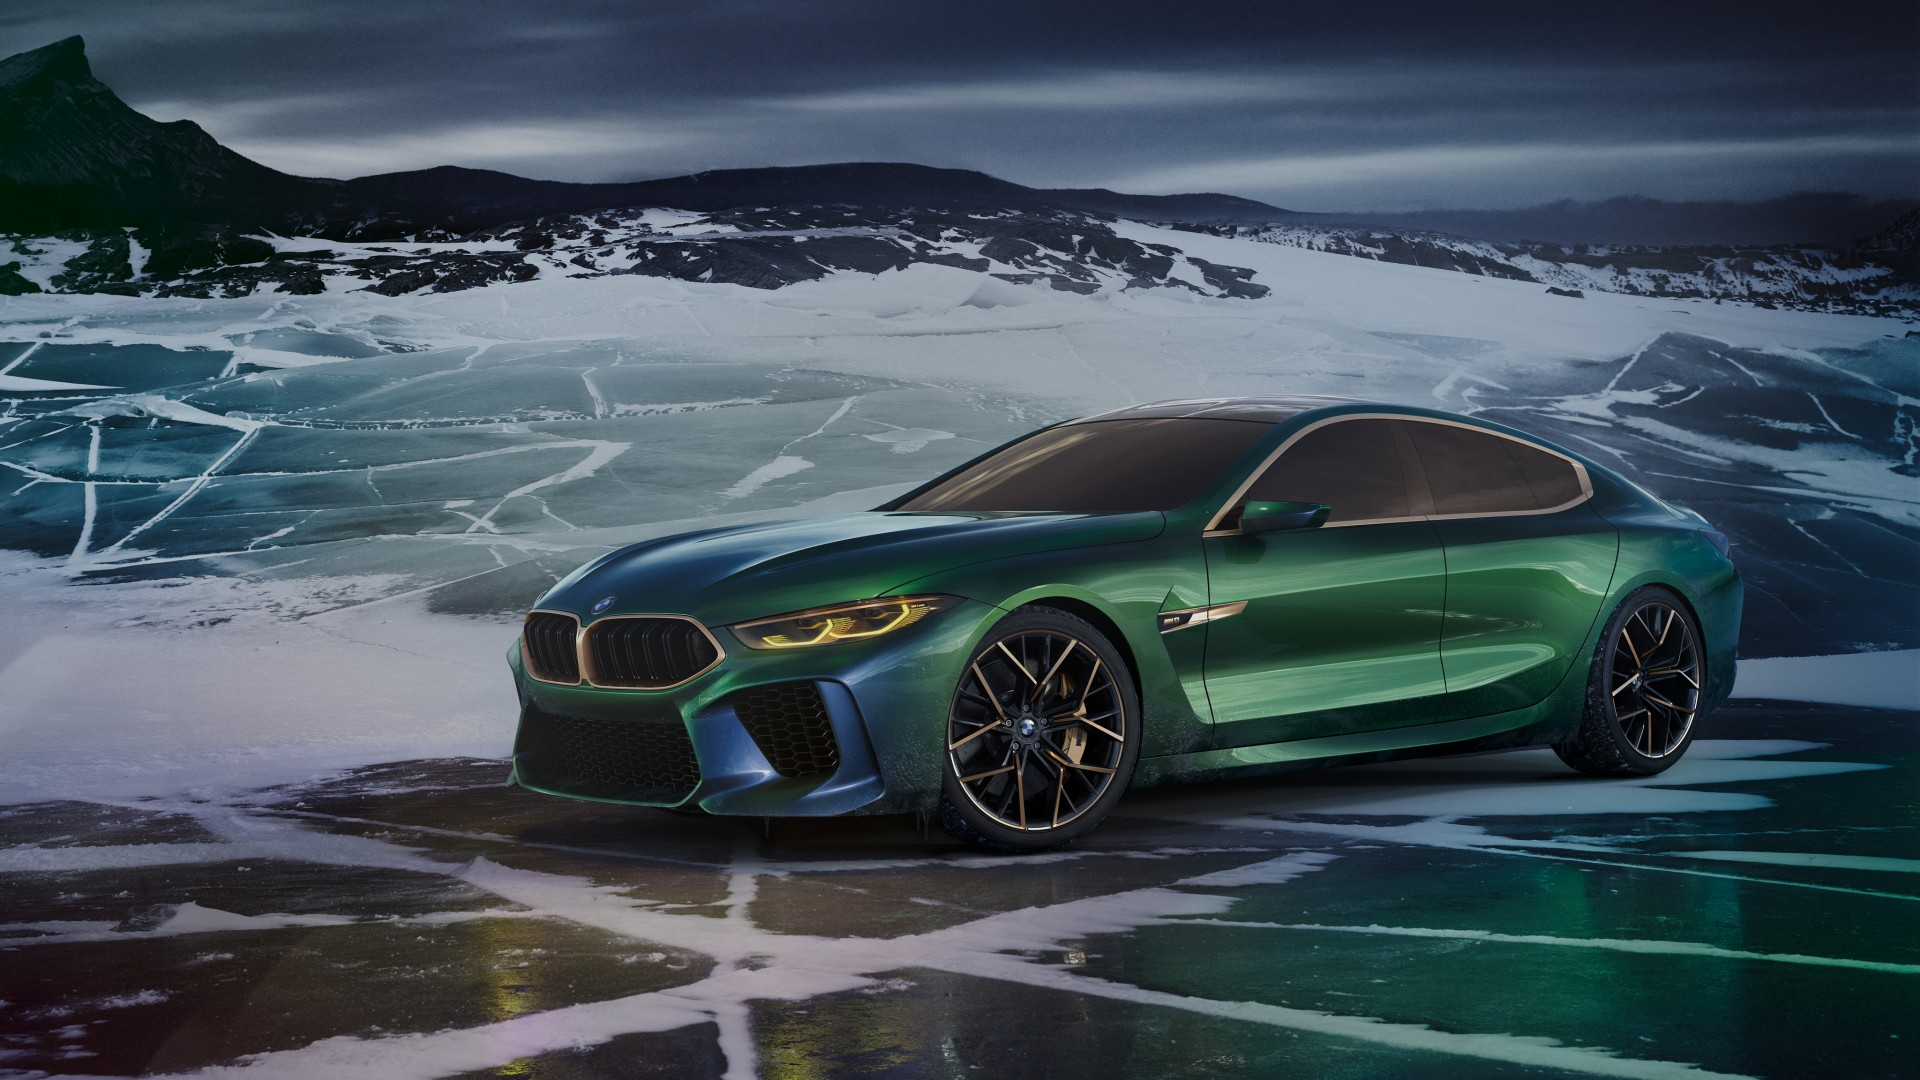 2018 Bmw Concept M8 Gran Coupe 4k 2 Wallpaper Hd Car